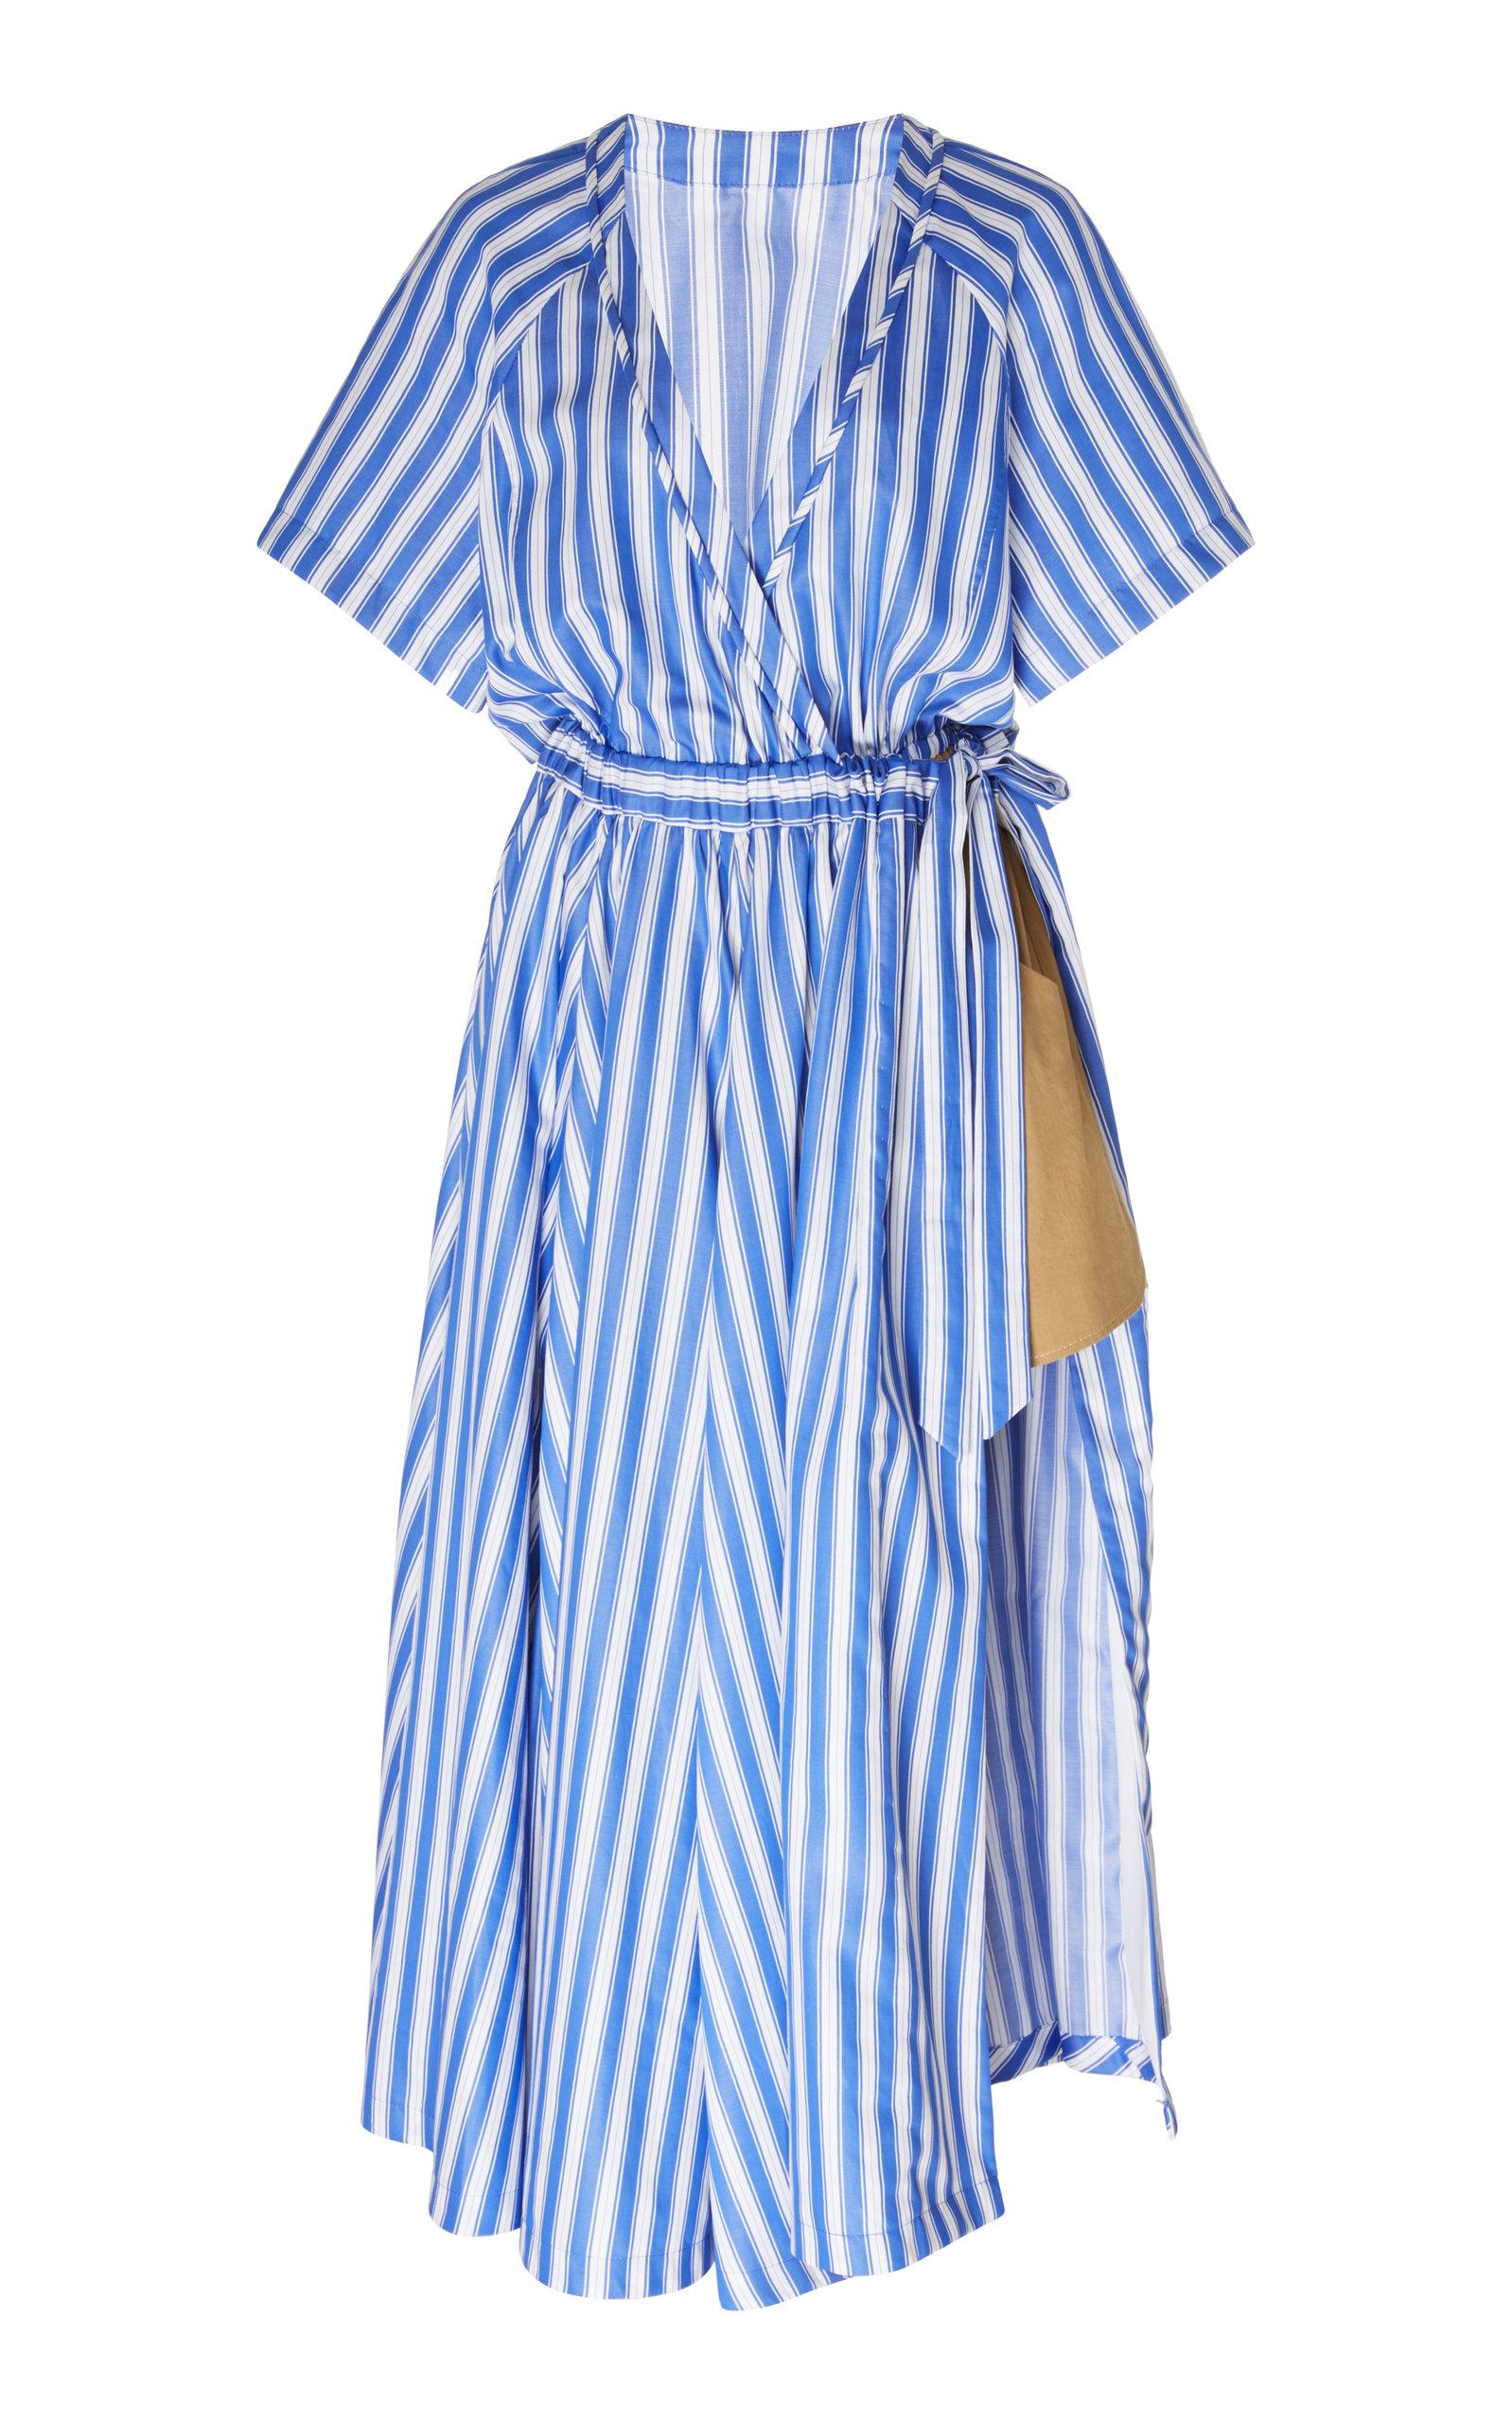 Buy Rosie Assoulin Striped Cotton-Poplin Wrap Dress online, shop Rosie Assoulin at the best price